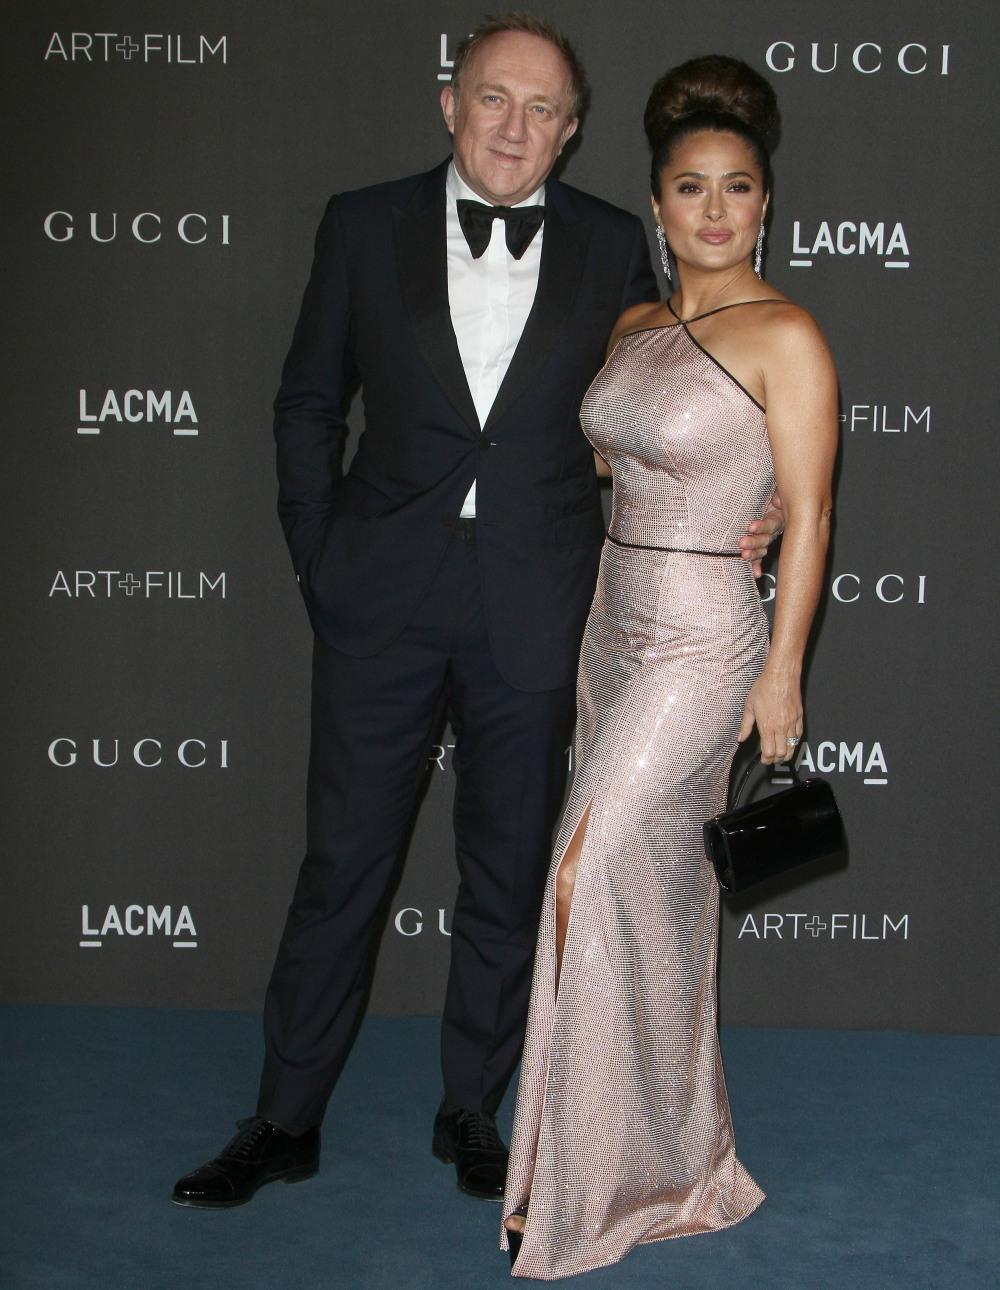 Francois-Henri Pinault, Salma Hayek attends  the 2019 LACMA ART +FILM GALA in Los Angeles